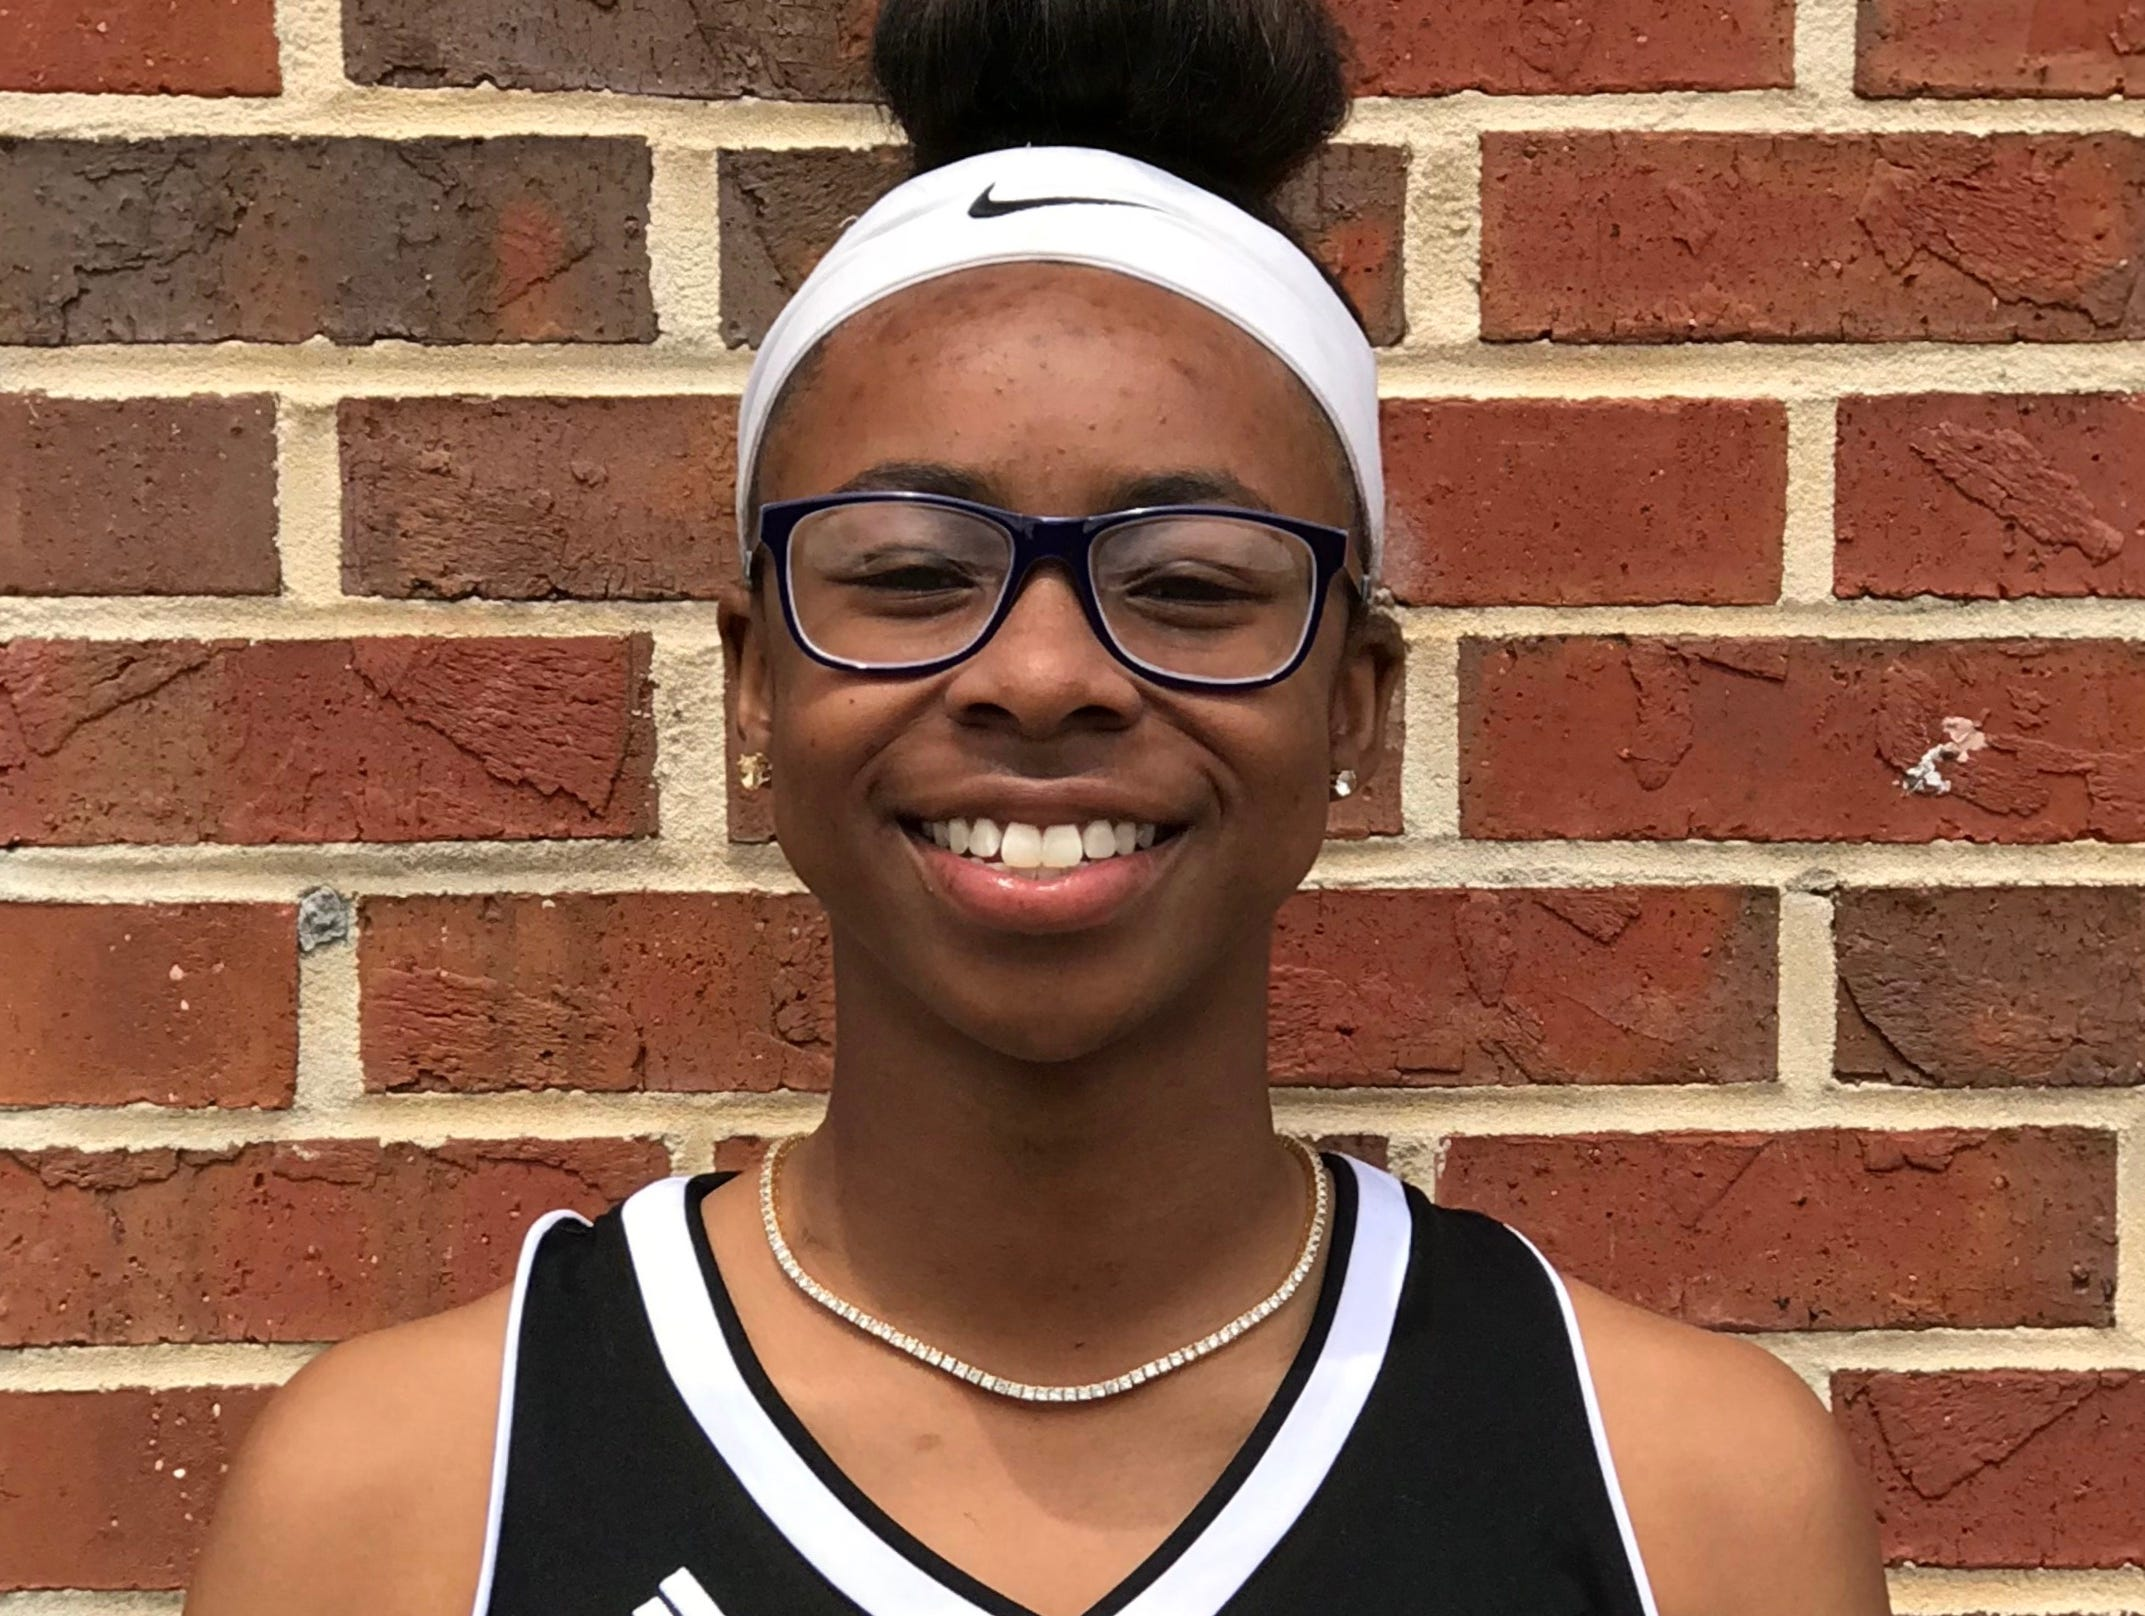 Gadsden County senior point guard Ta'Nija Watson was named to the 2019 All-Big Bend girls basketball first team.